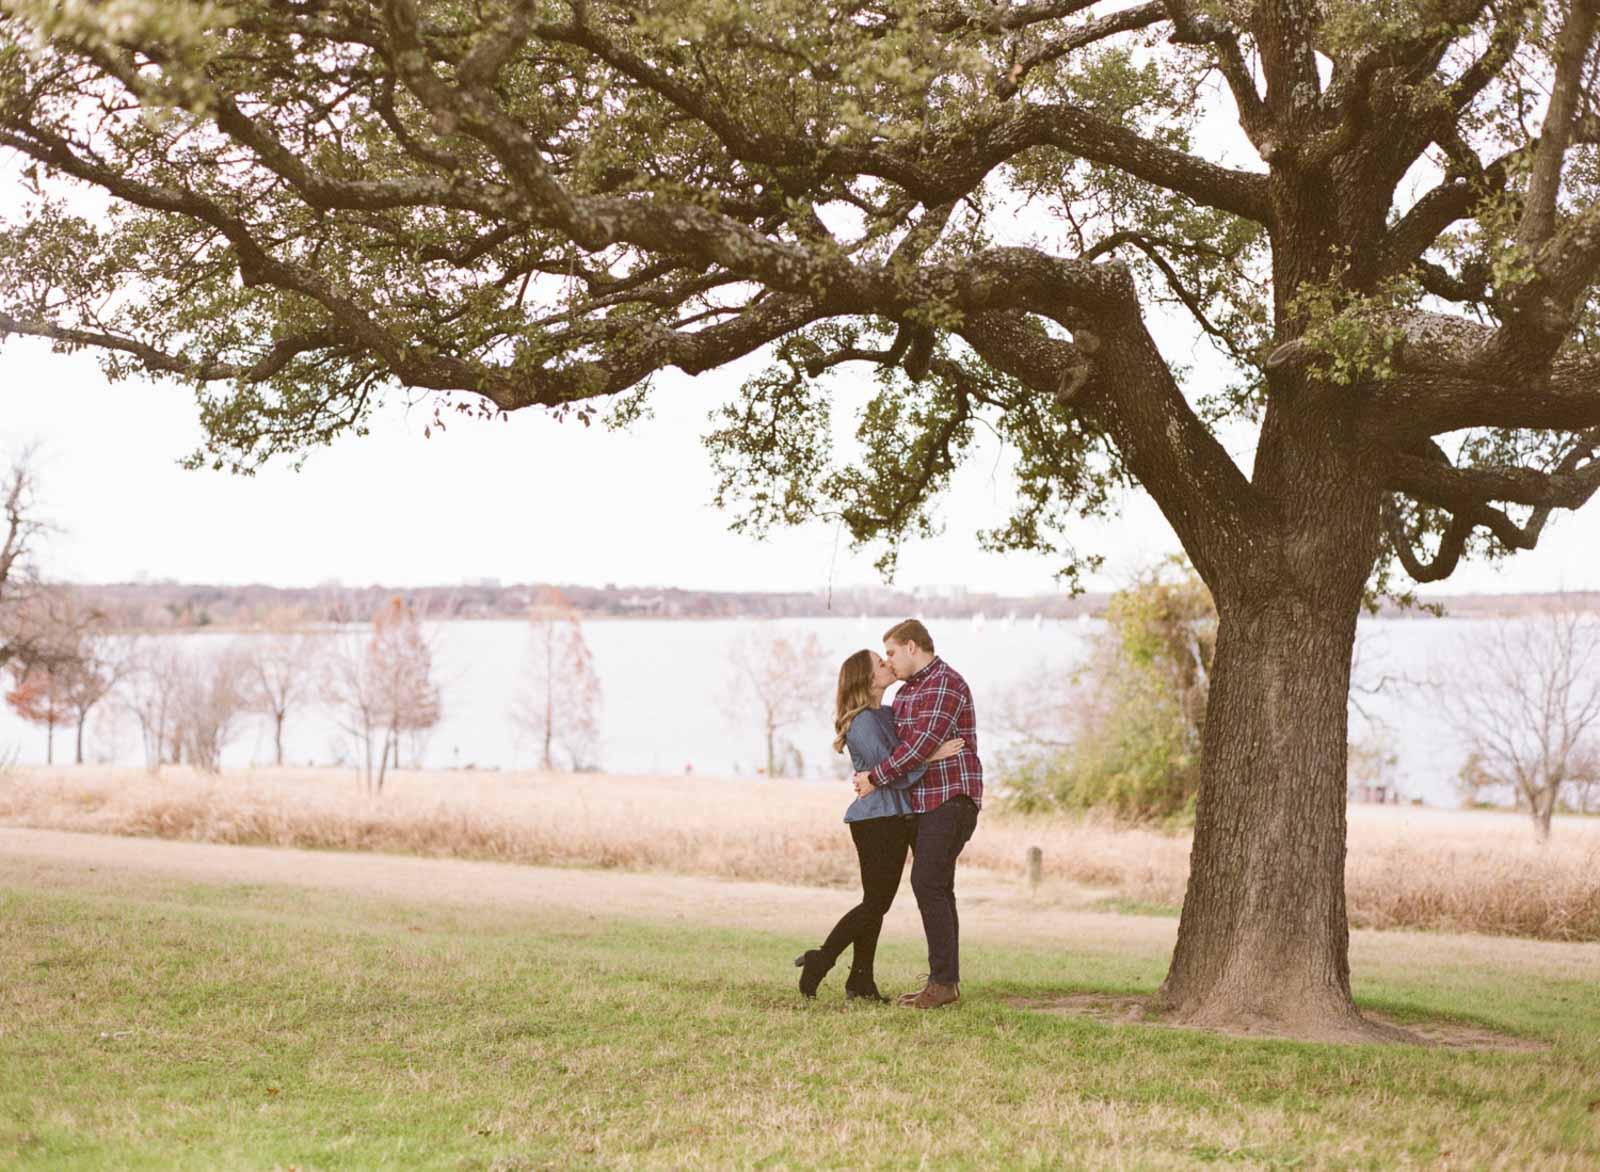 Dallas Arboretum Engagement-JenSymes-70.jpg